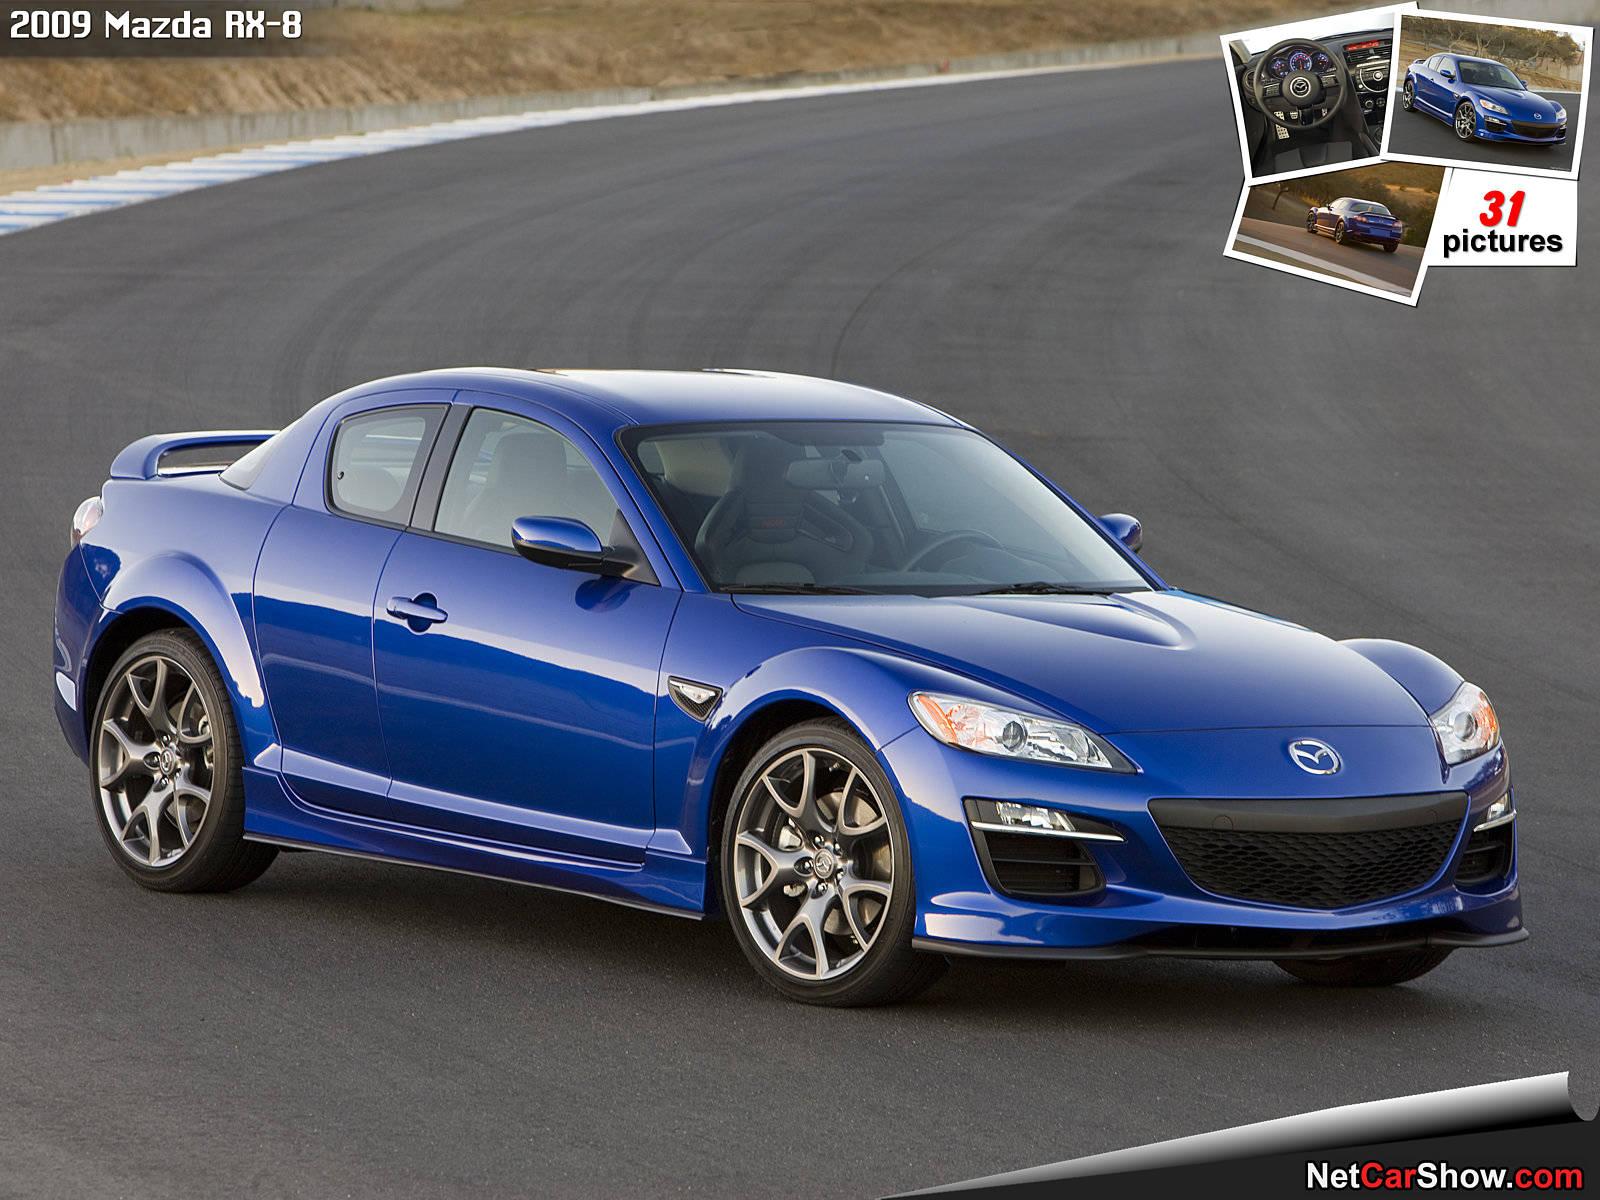 https://d2pye4zfc3qqup.cloudfront.net/wp-content/uploads/2017/07/08151358/Mazda-RX-8-2009-1600-04.jpg